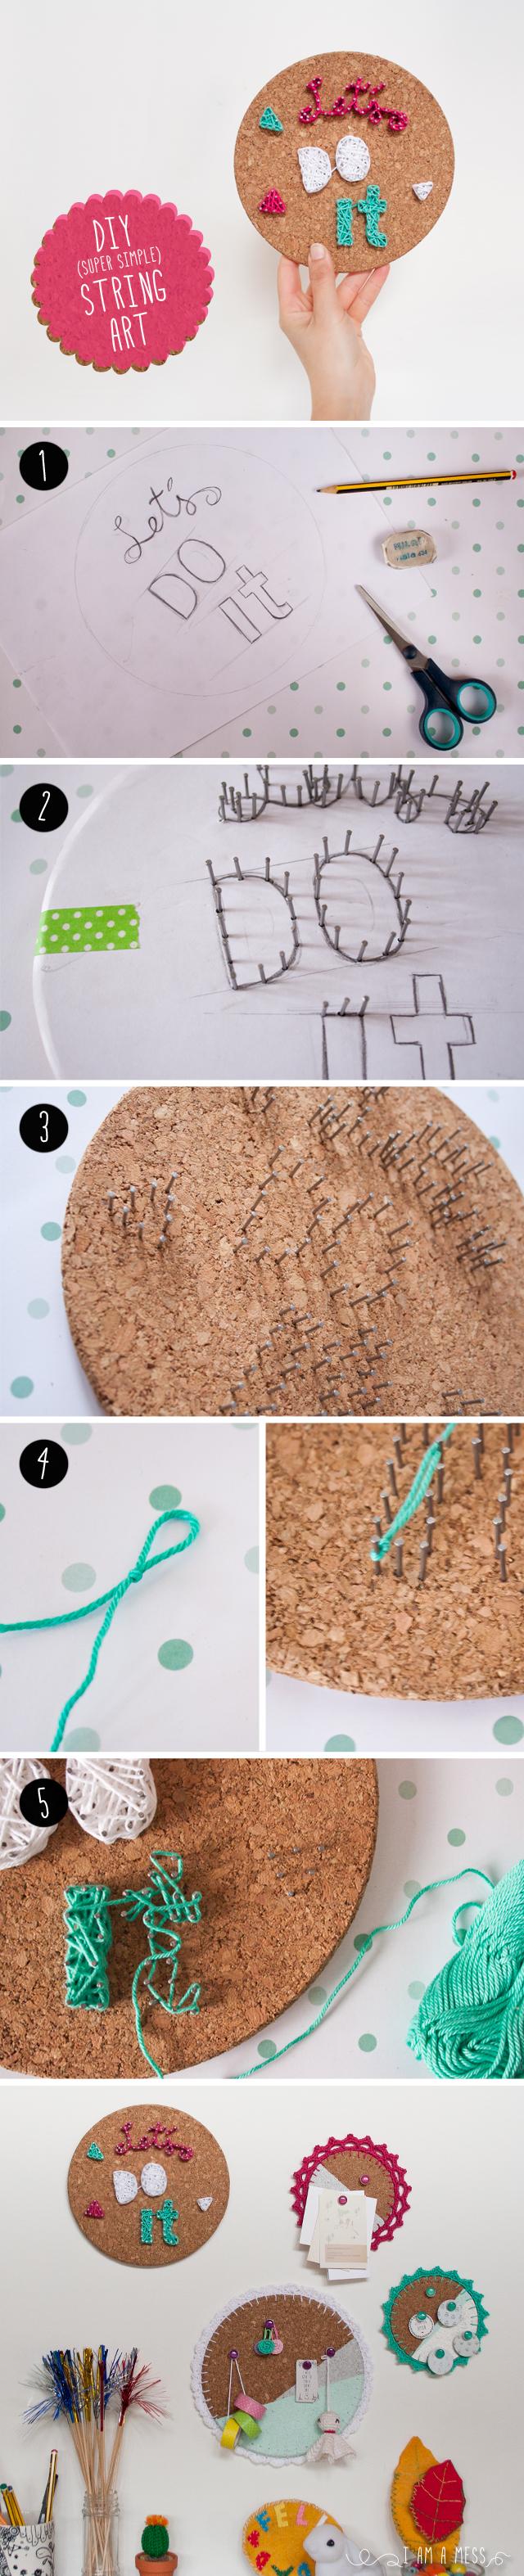 "DIY cork string art  steps by ""I am a Mess"""